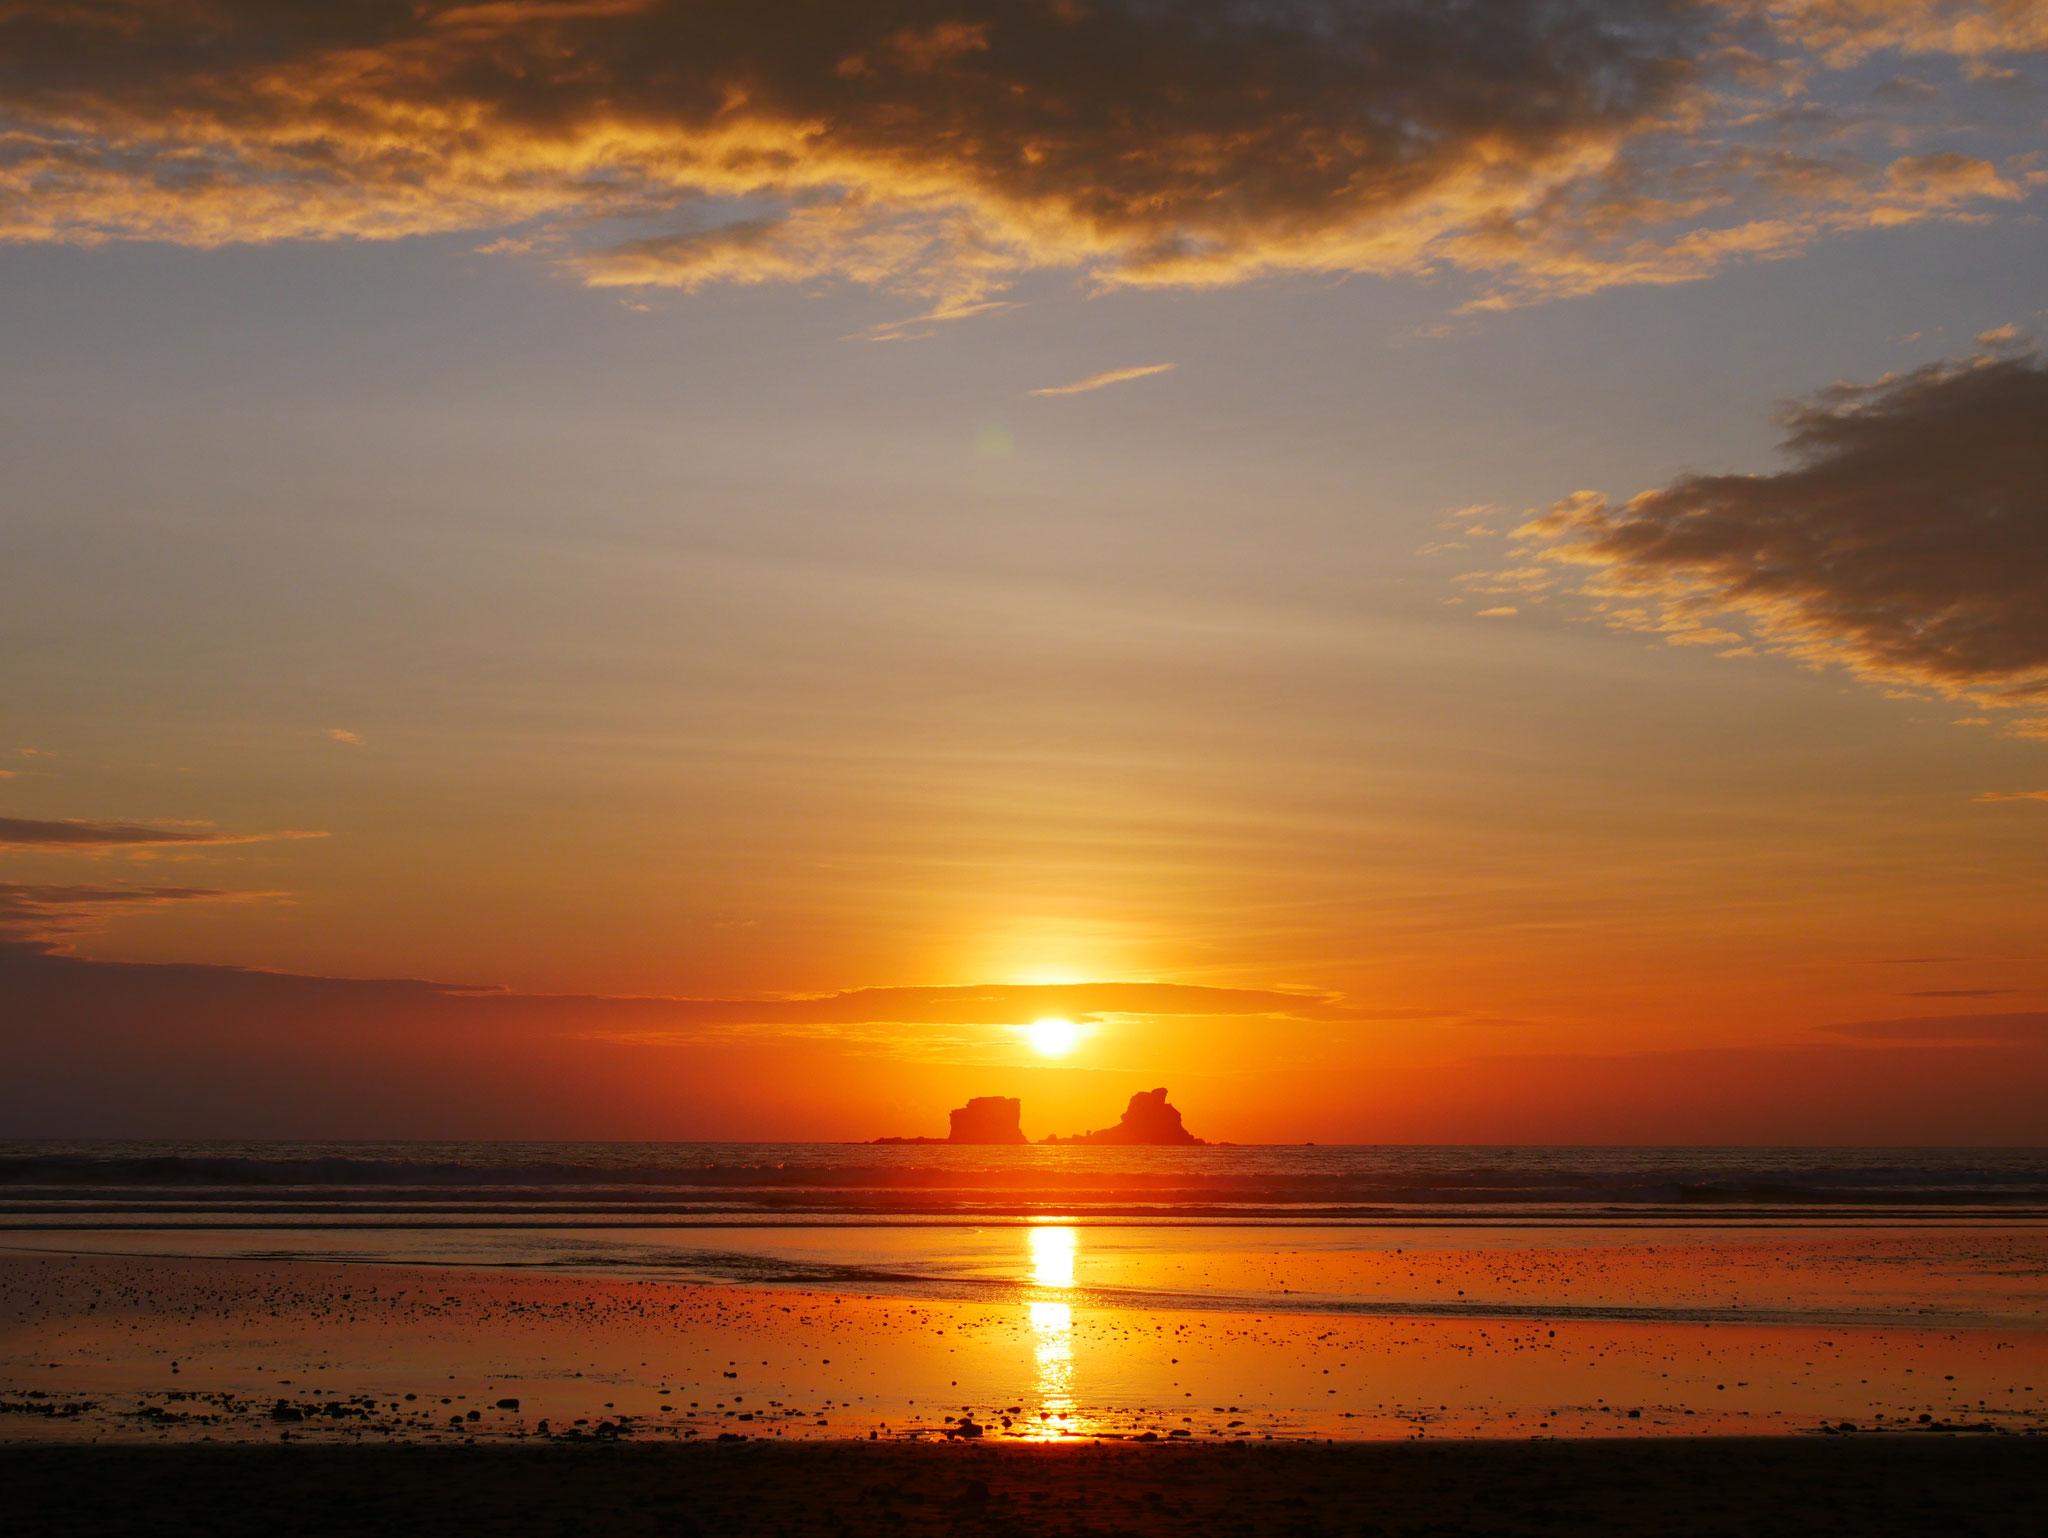 Sonnenuntergang in Ayampe